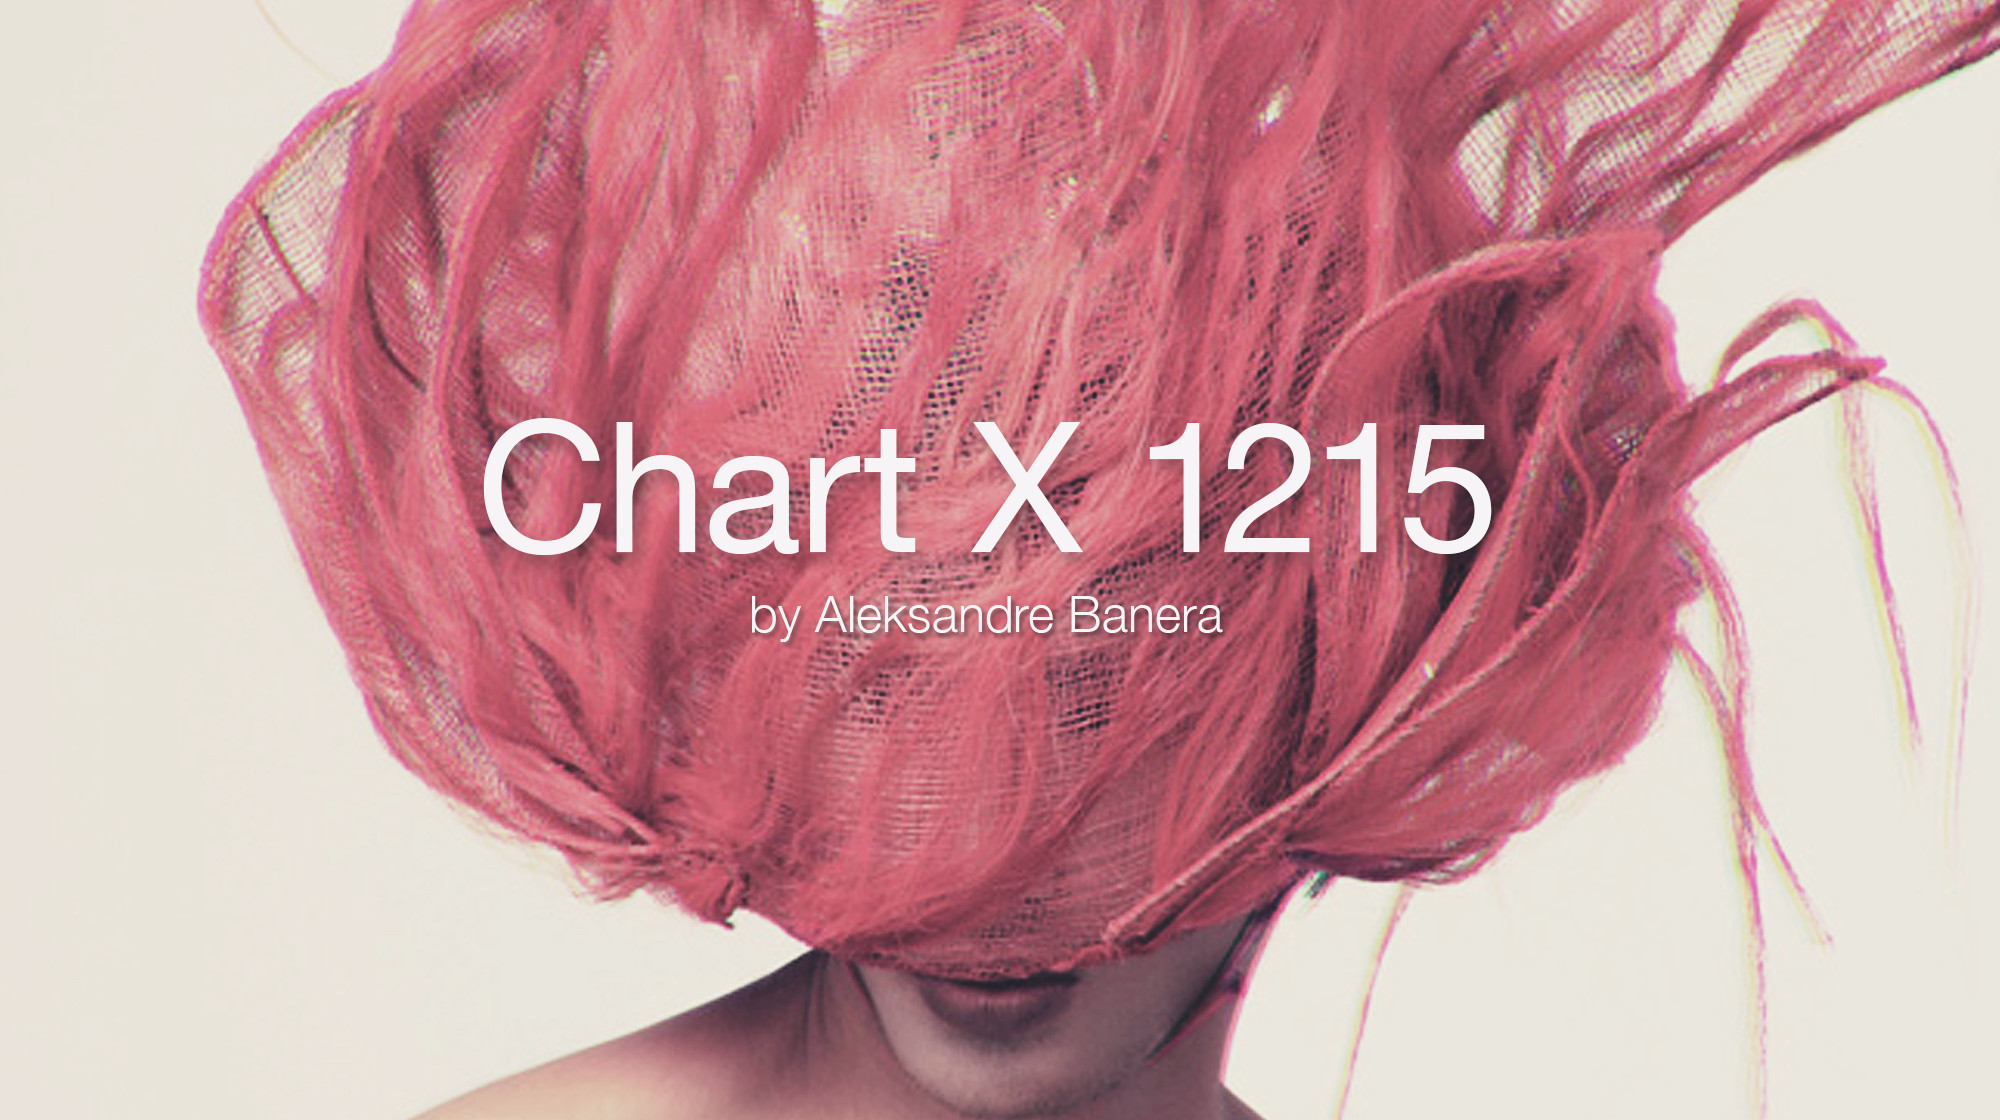 Chart X 1215 by Aleksandre Banera